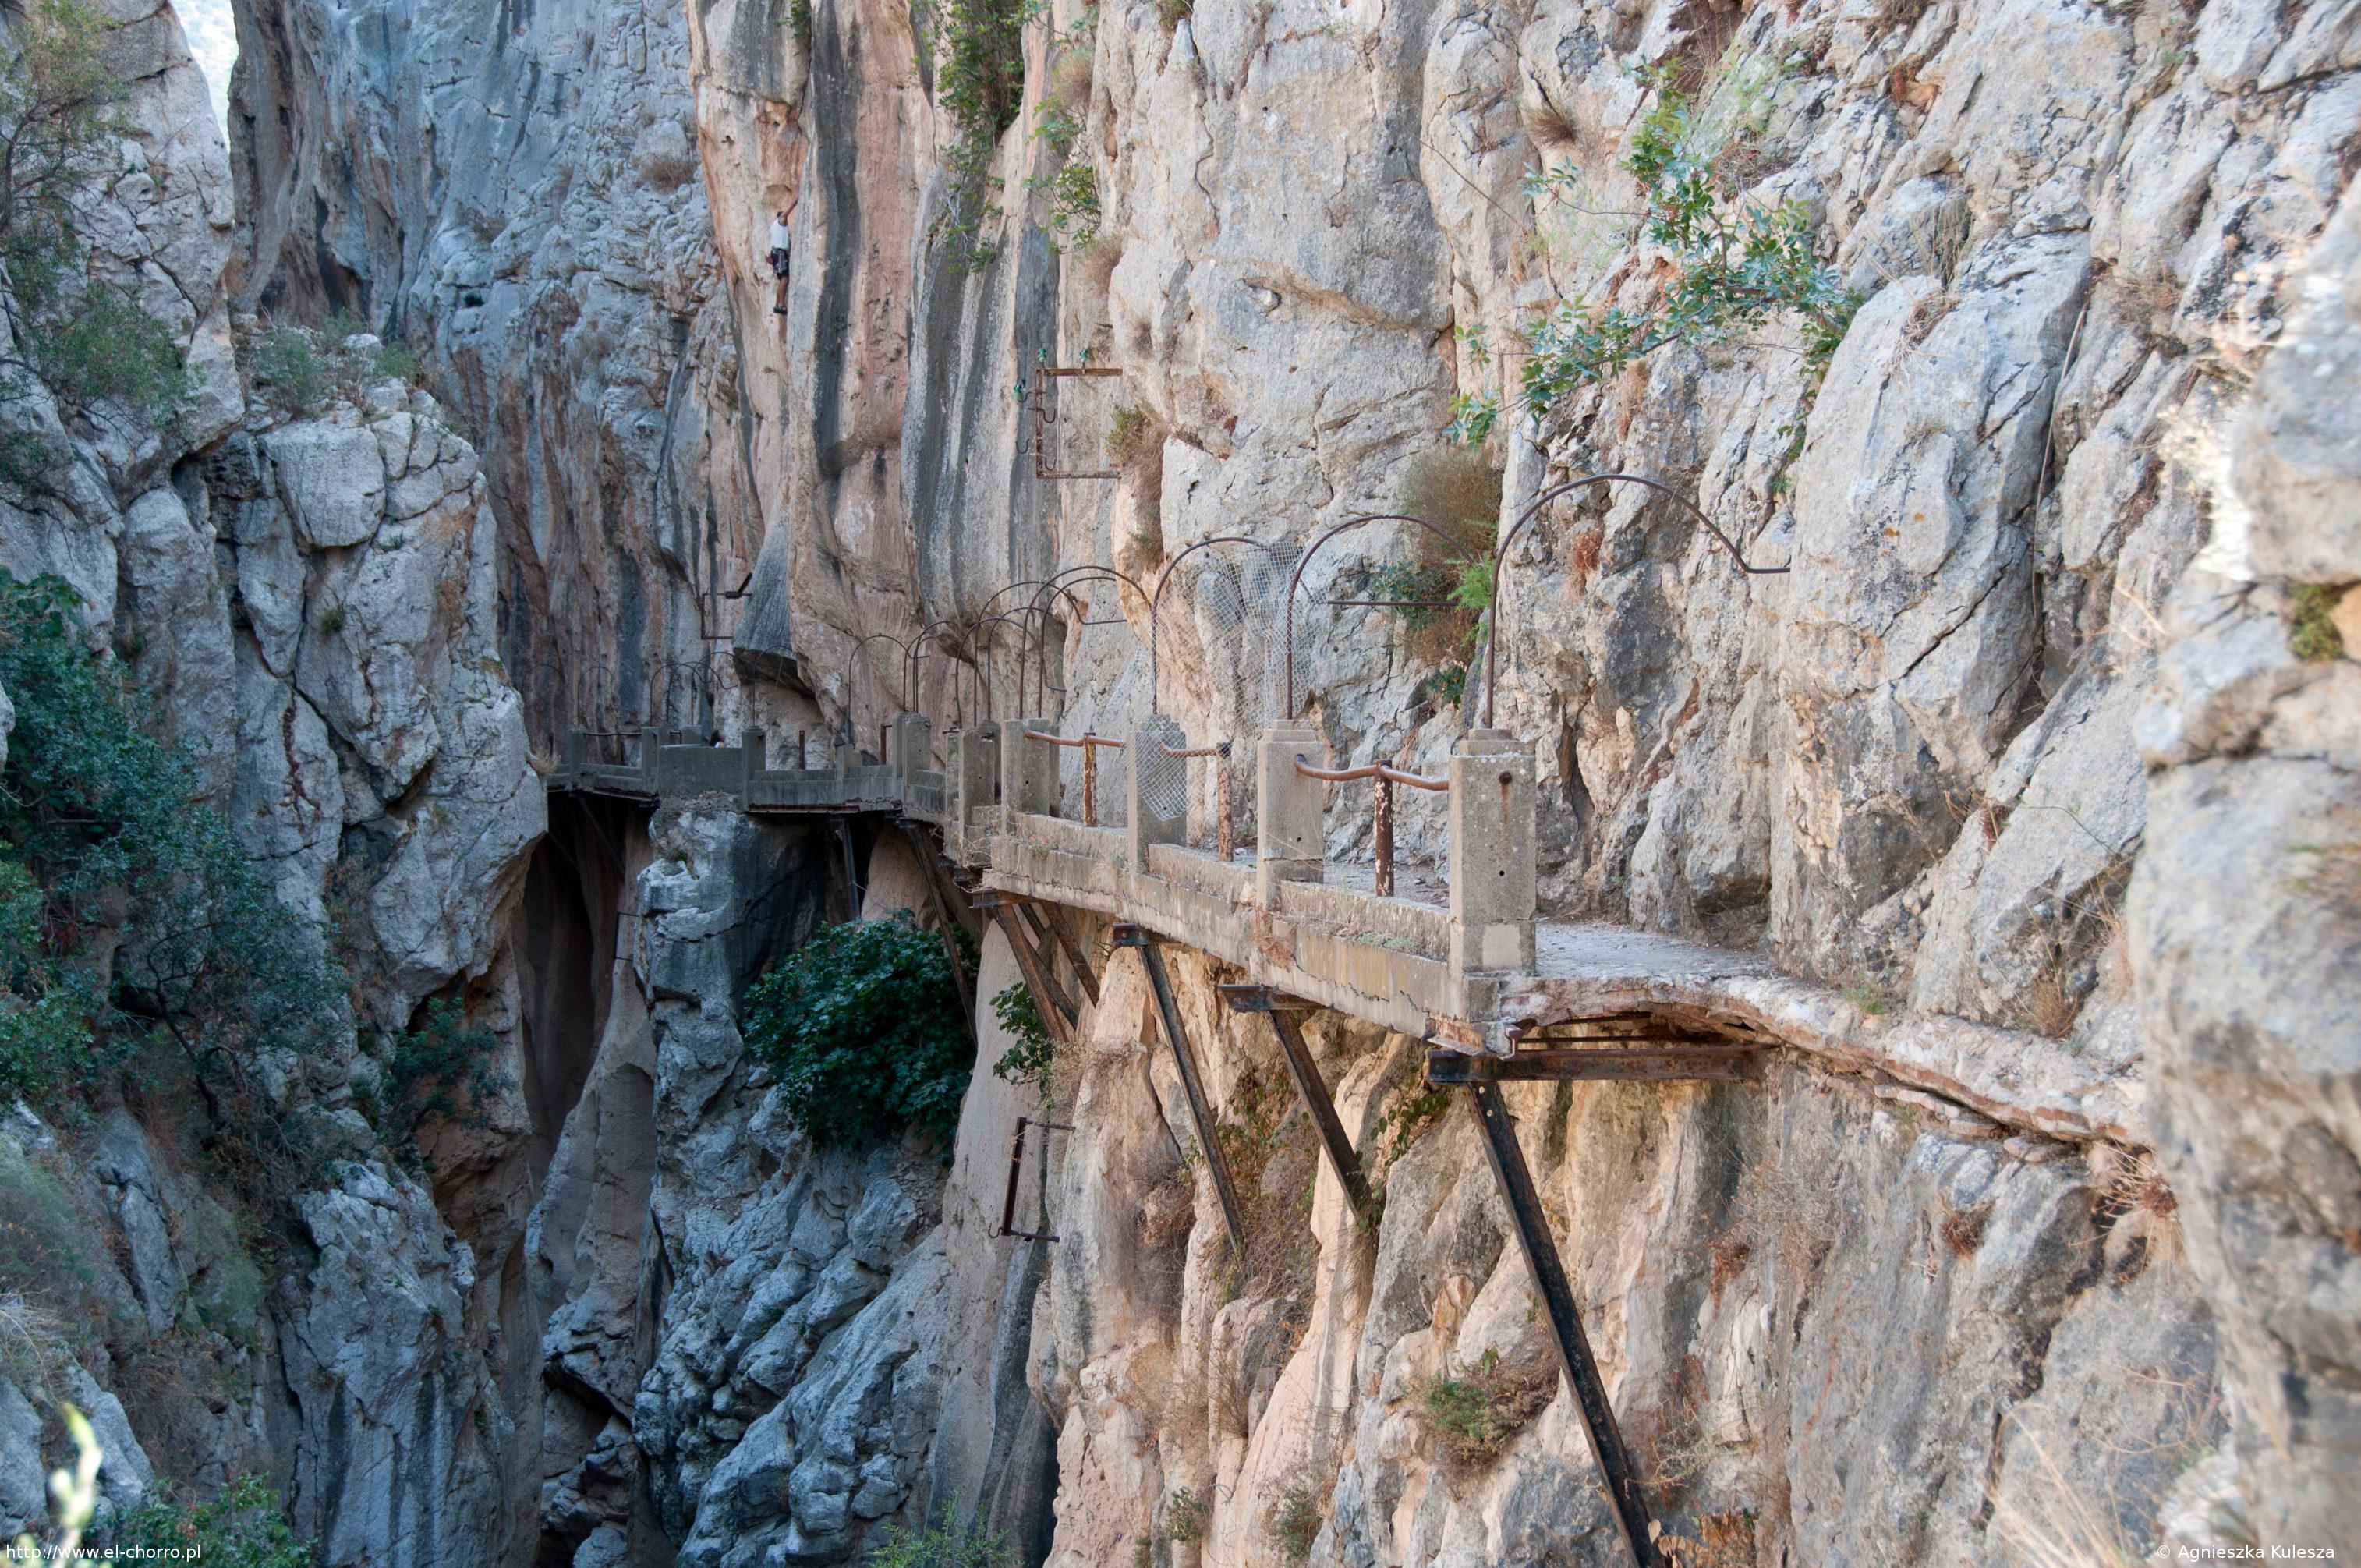 Caminito del Rey wewnątrz kanionu - Galeria zdjęć El Chorro - el-chorro.pl